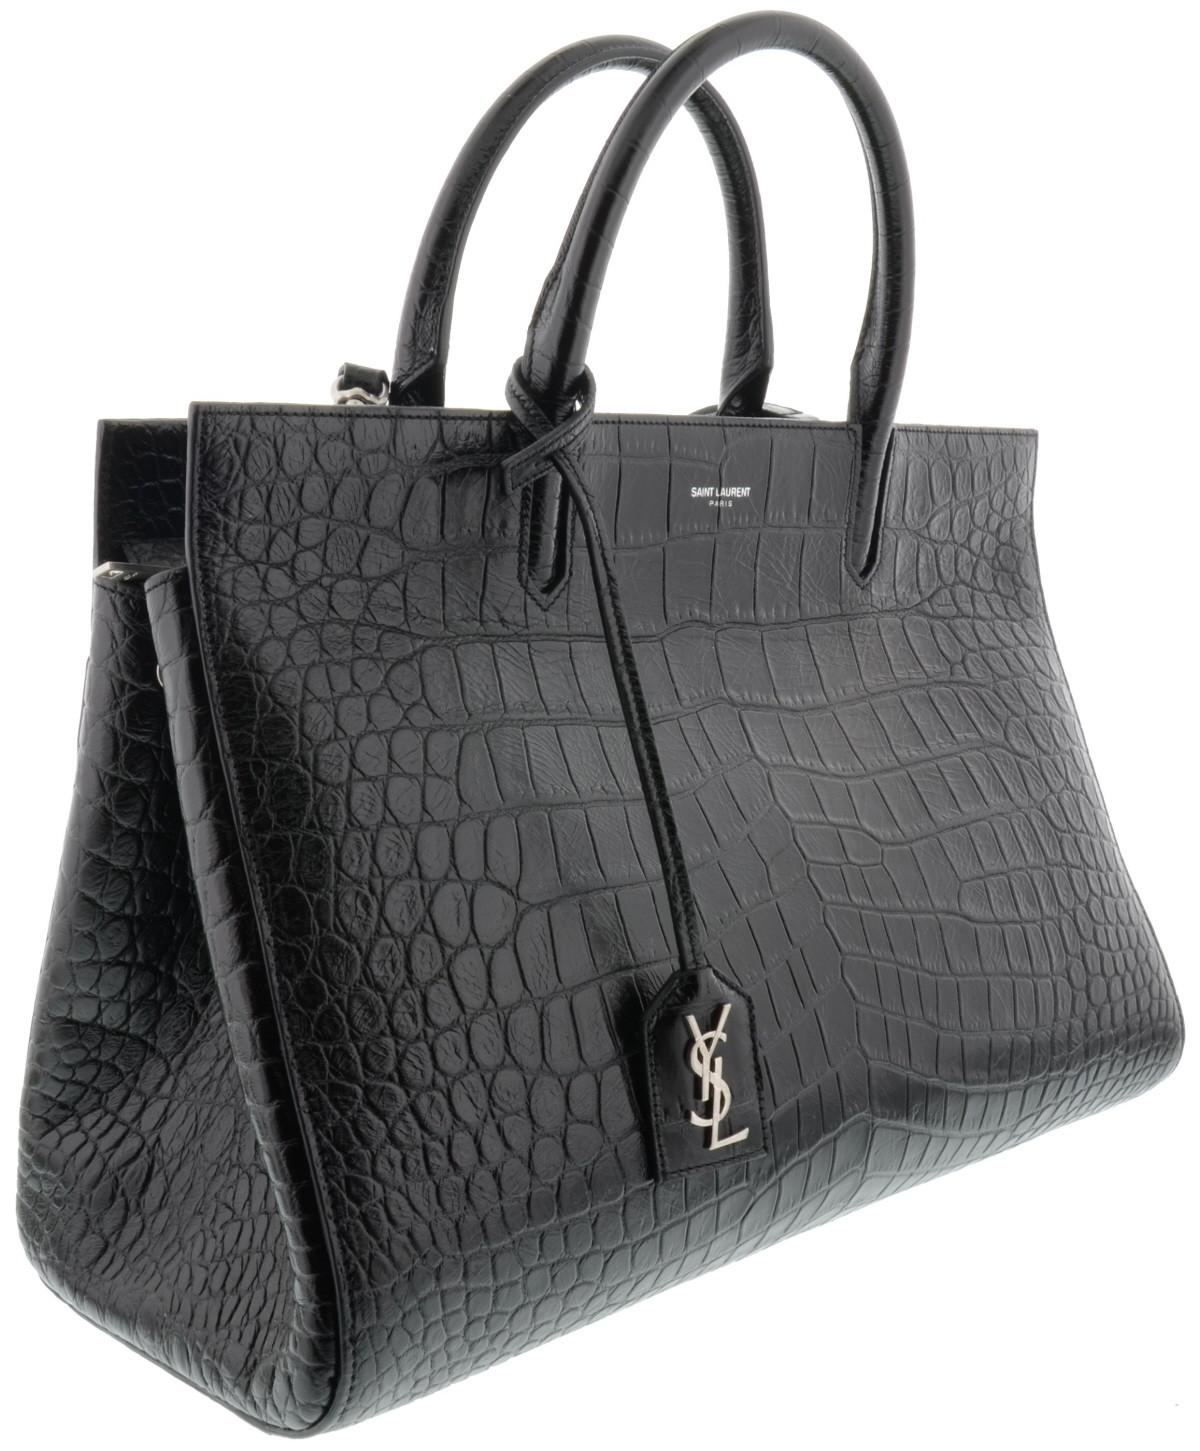 ysl mini cabas chyc black - medium cabas rive gauche bag in black crocodile embossed leather